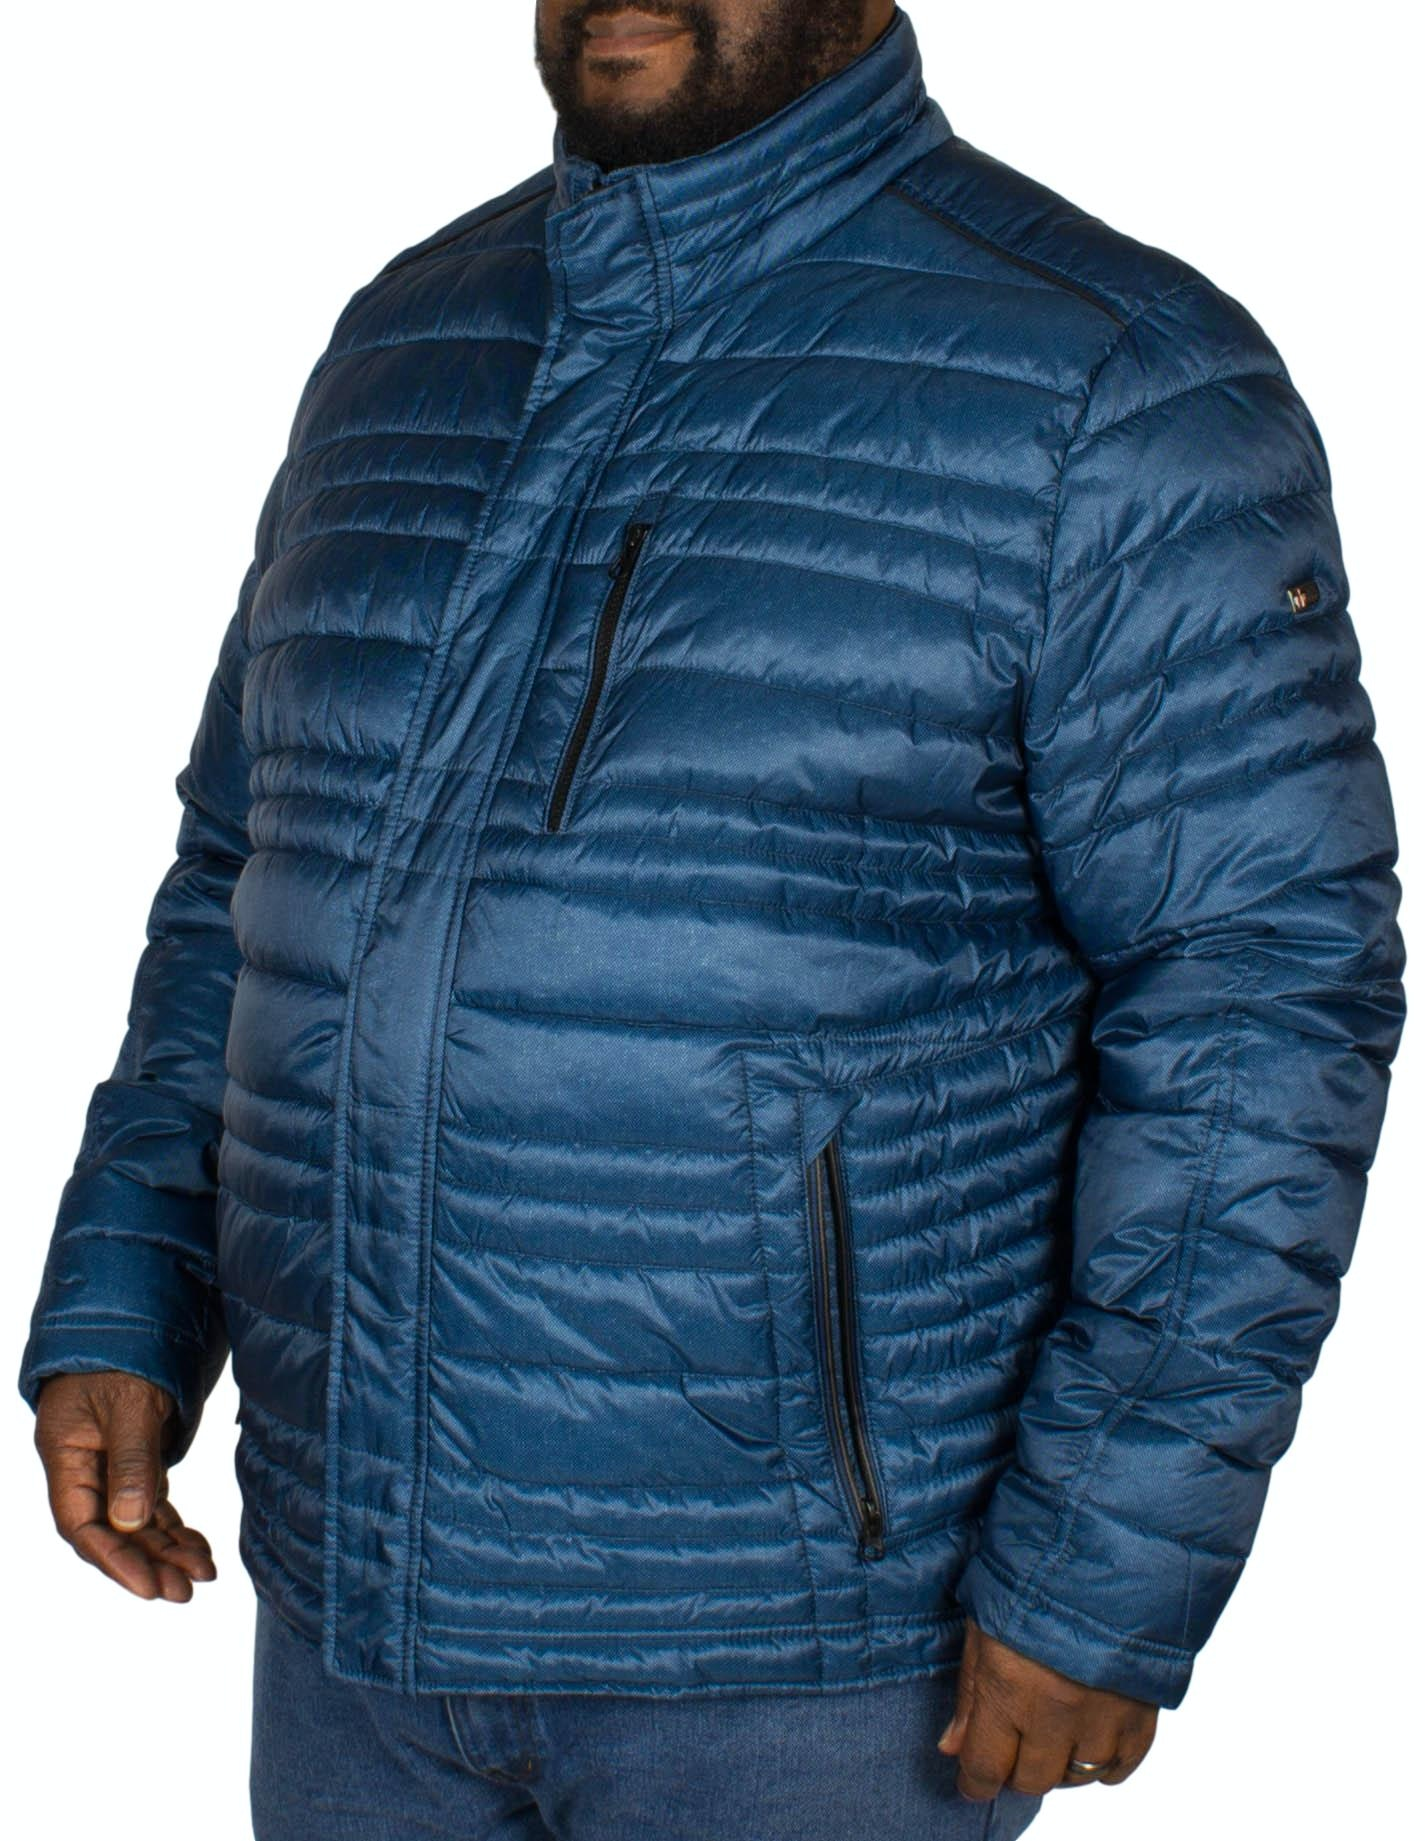 Cabano Tech Down Blouson Jacket Blue